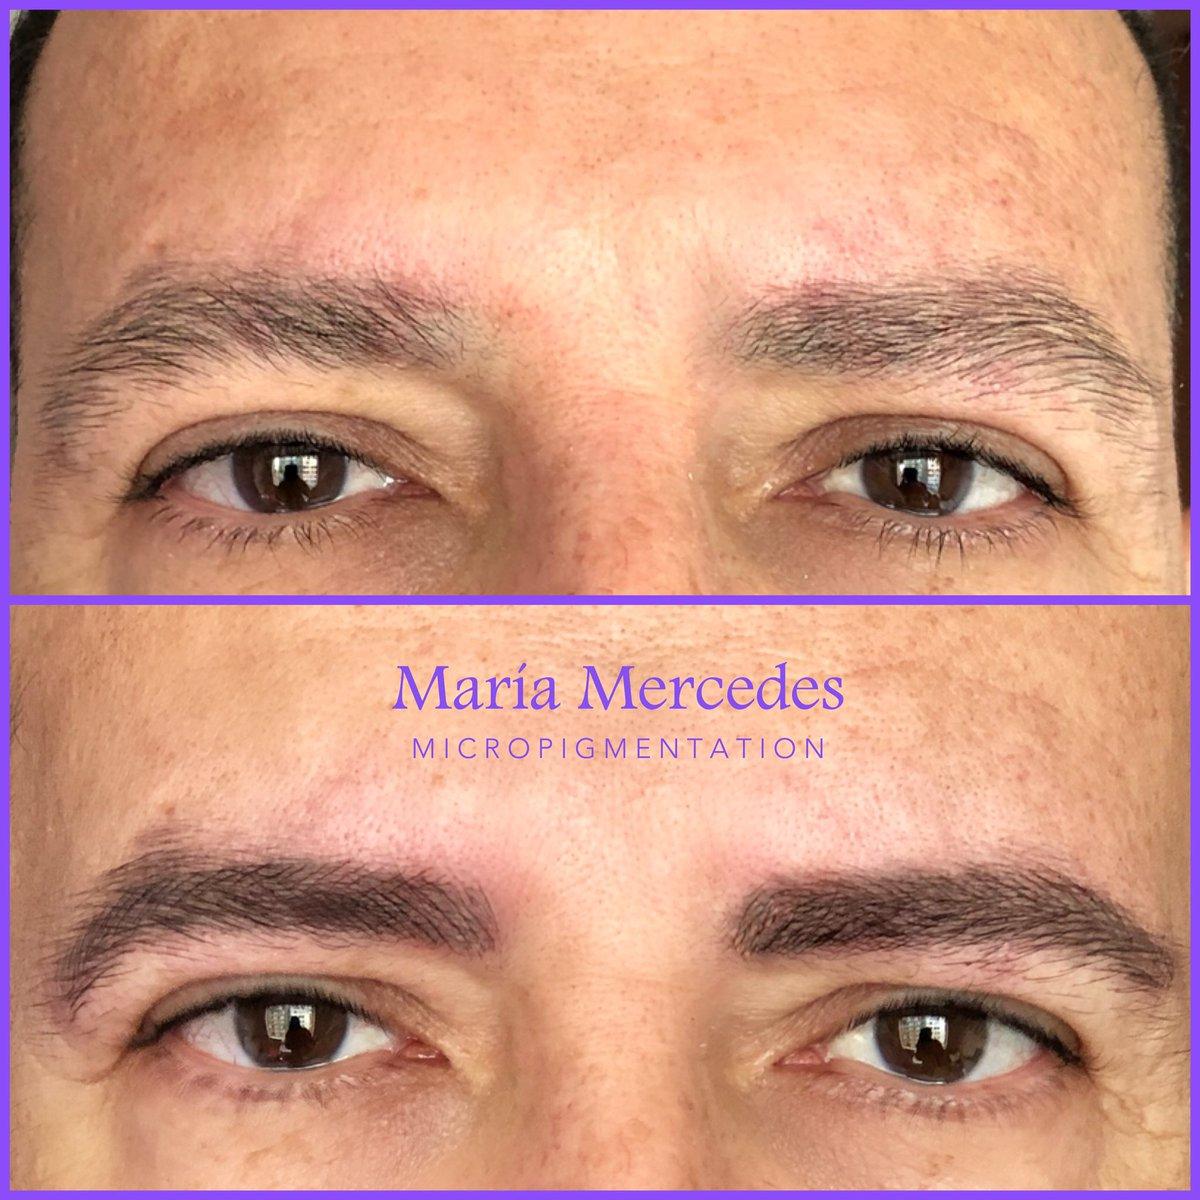 #microbladingbrows #microshading #perfecteyebrows #cejaspeloporpelo #cejas3d #microblading #cejasperu #cejasperfectas #micropigmentation #eyebrowtattoo #3deyebrow #micropigmentacioncejas #browtattoo #microbladingperu #maneyebrows #menmicroblading #menbrows pic.twitter.com/GsNAxq3GlW